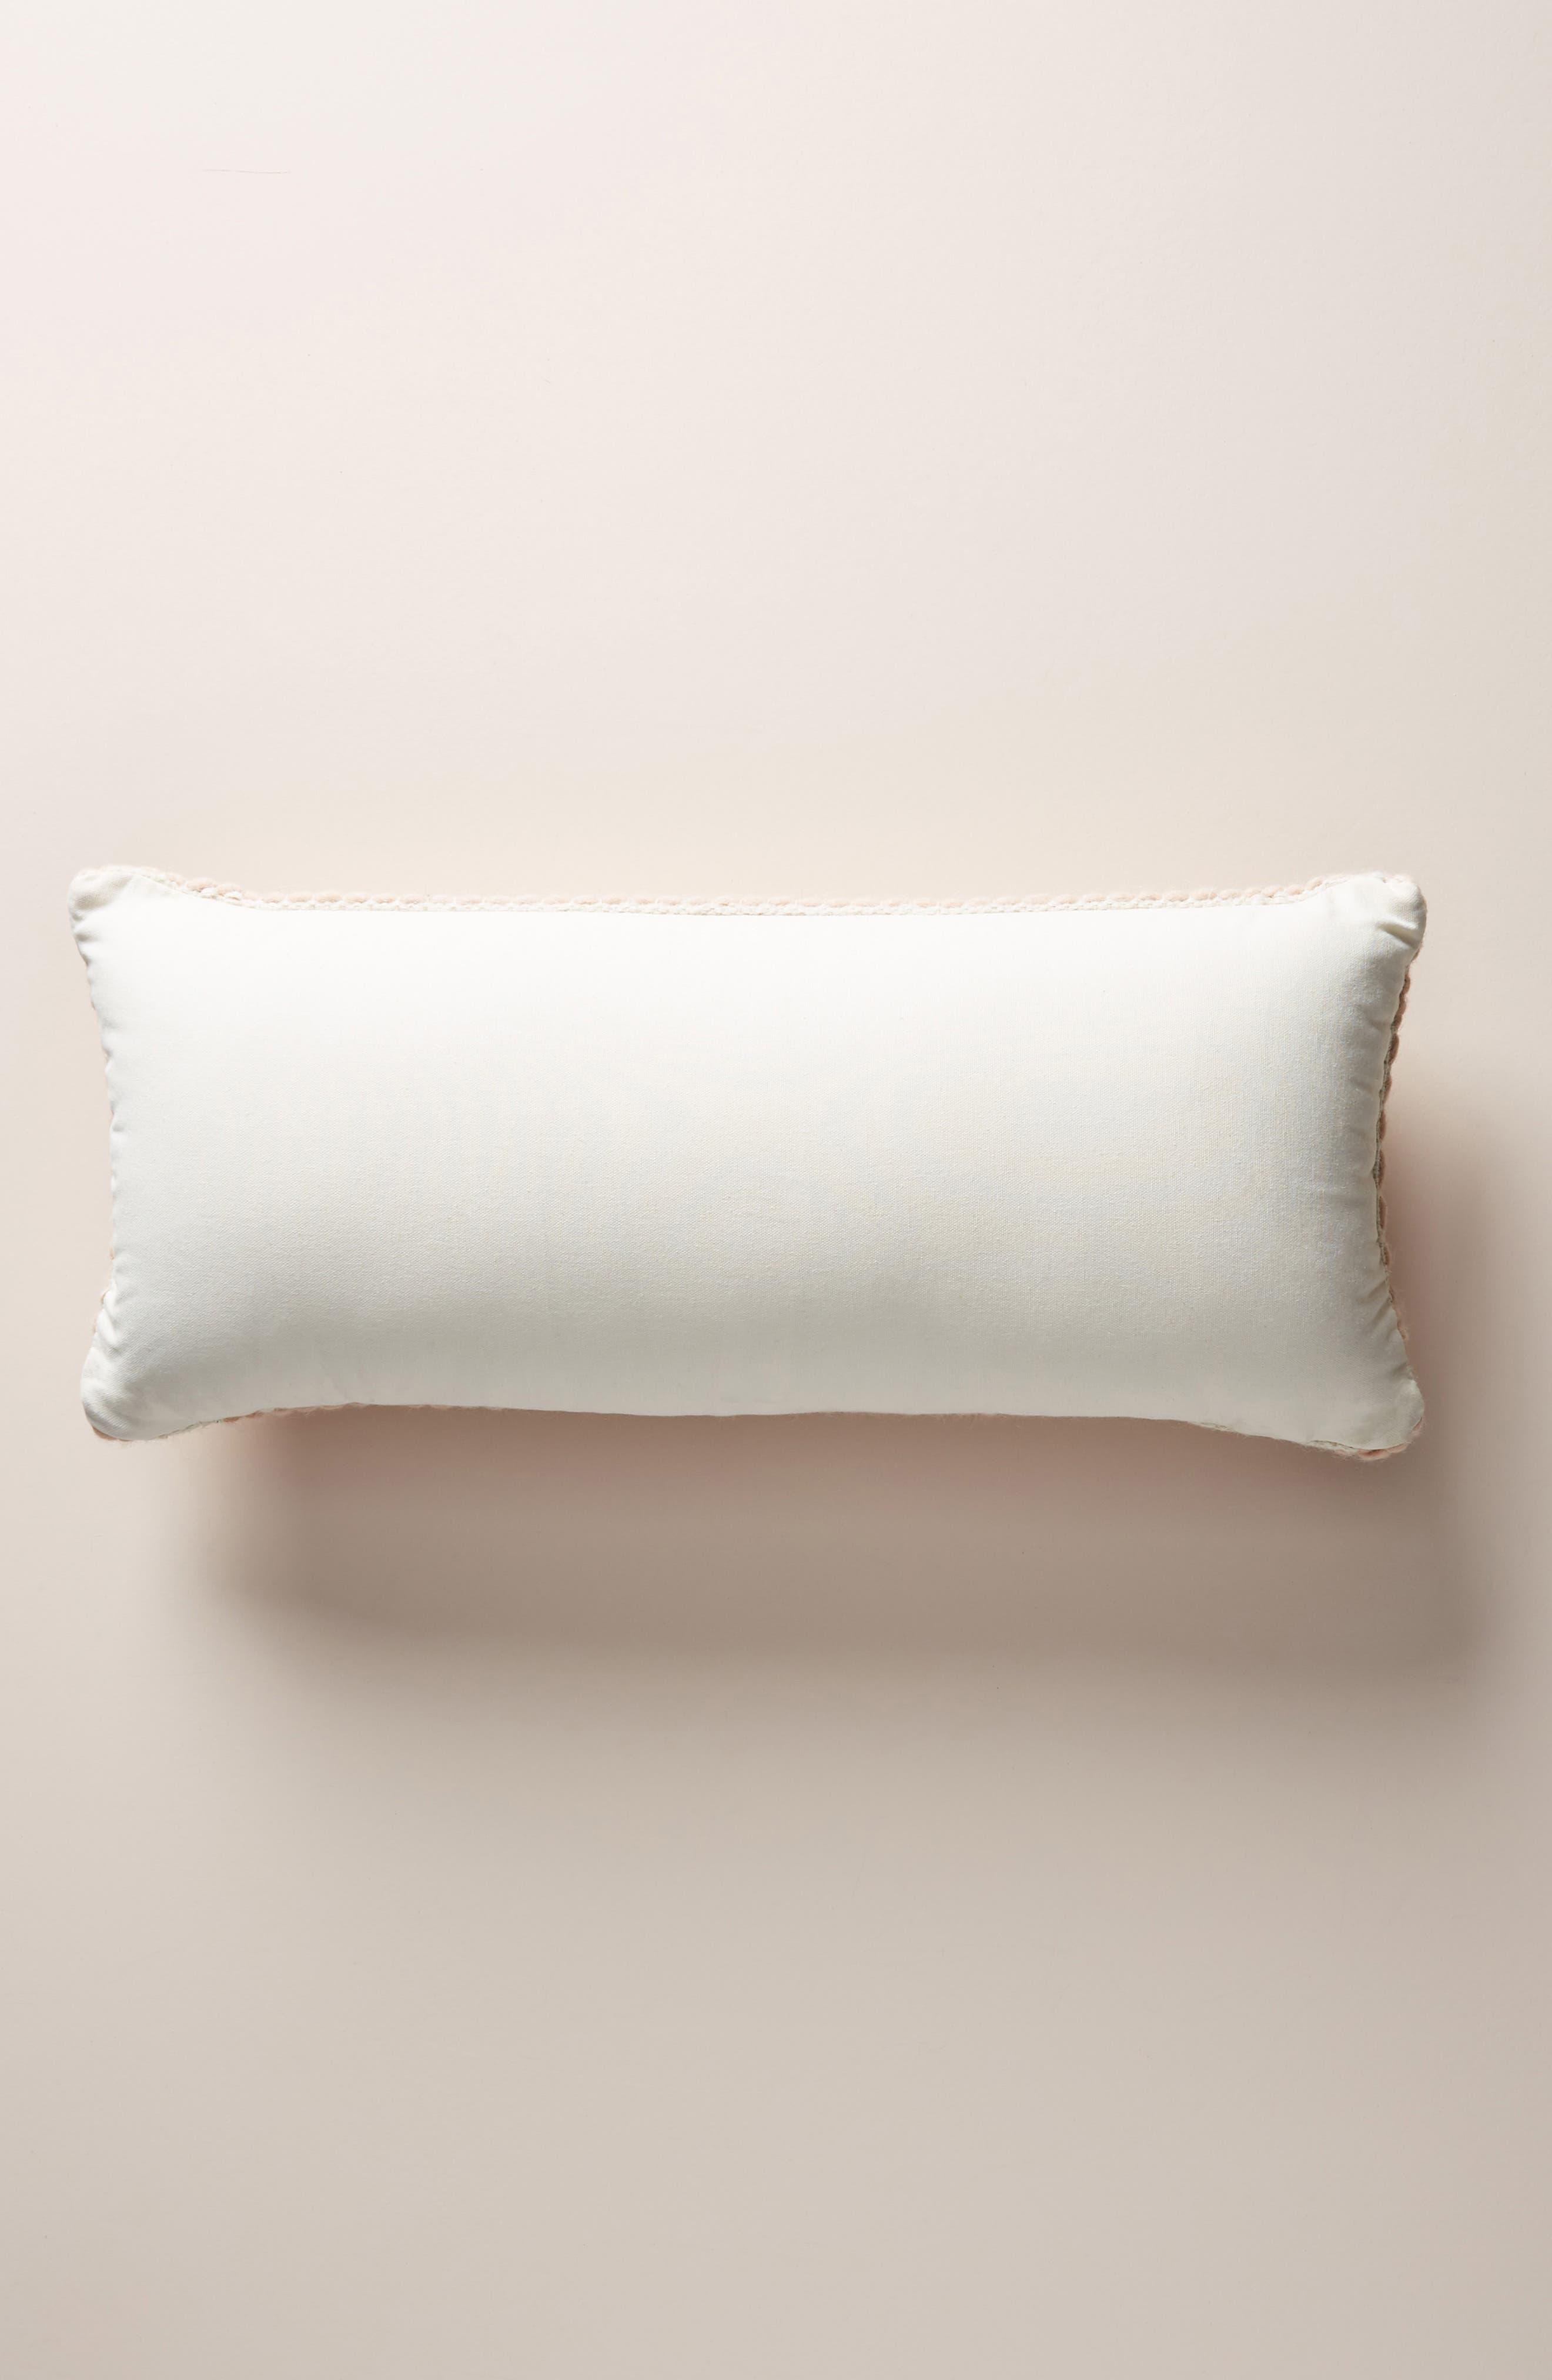 ANTHROPOLOGIE, Evie Bauble Accent Pillow, Alternate thumbnail 2, color, BLUSH